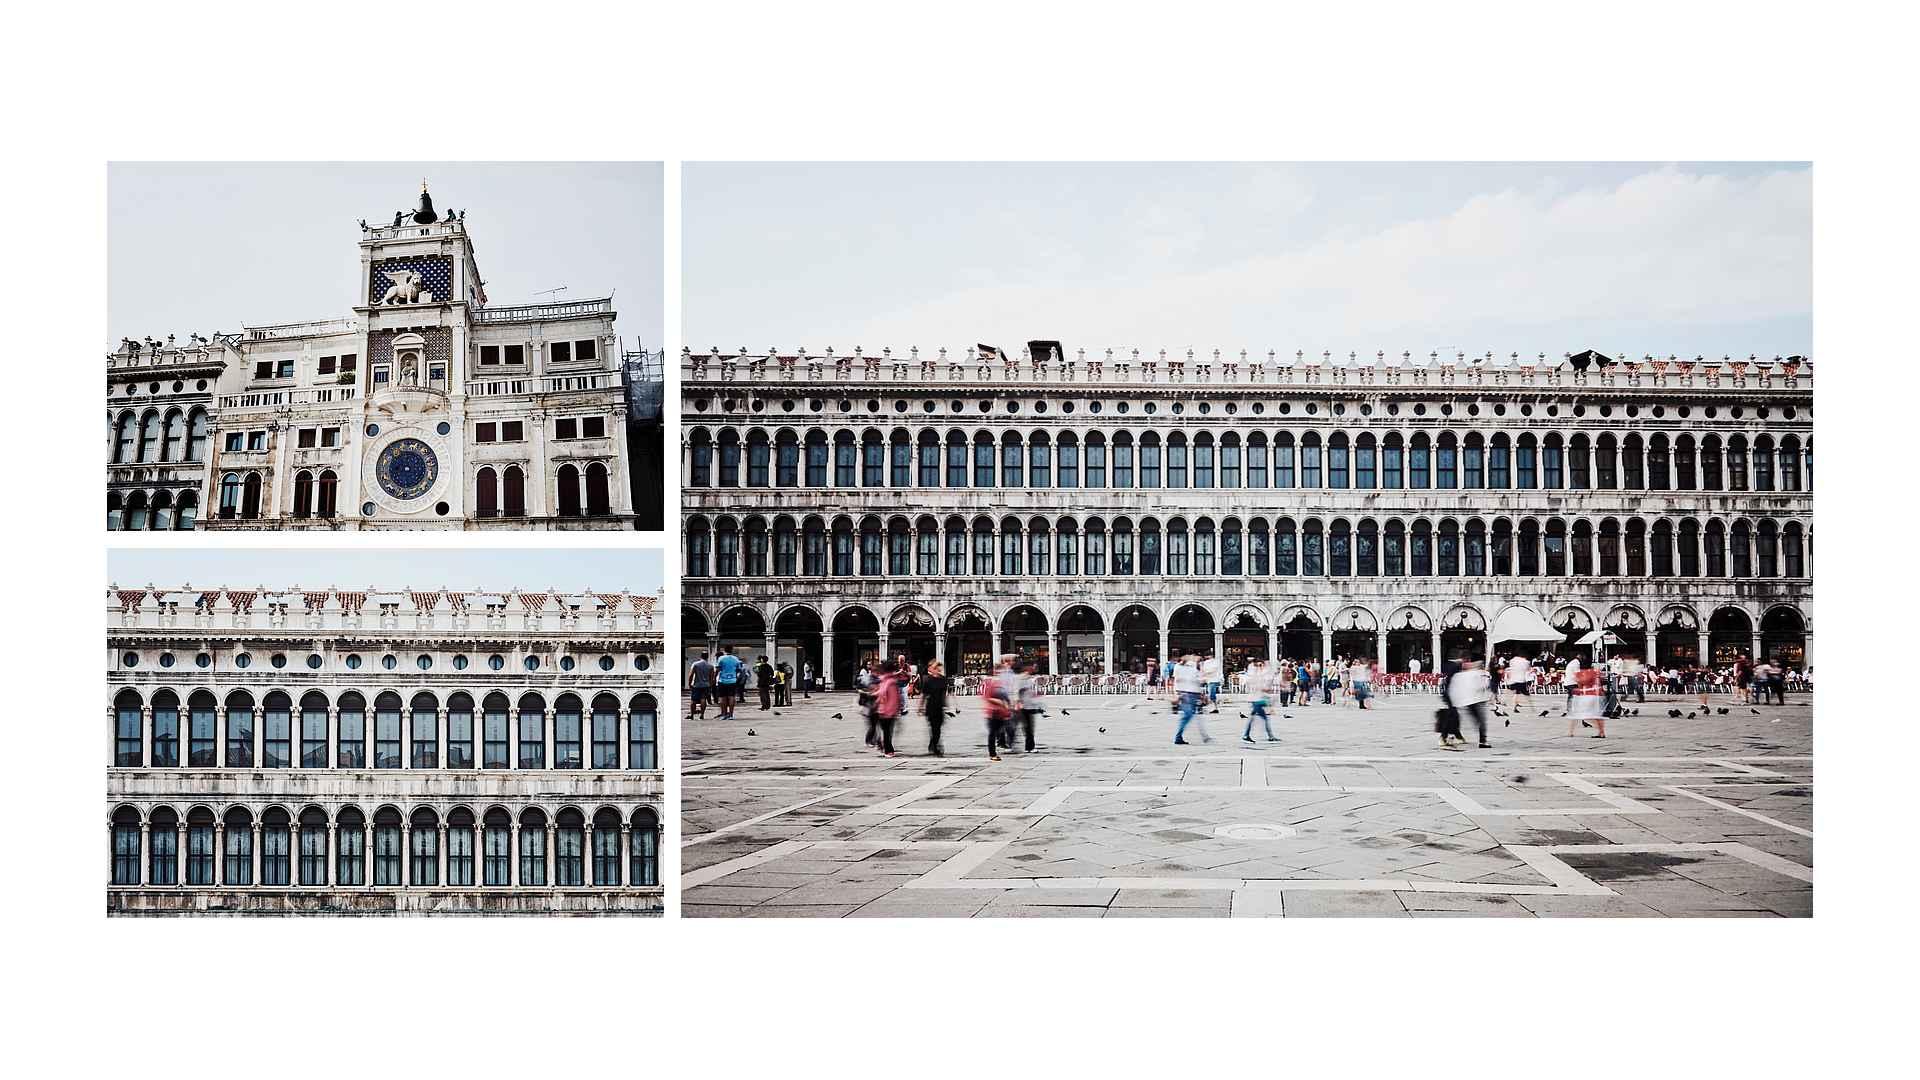 Plaza de San Marcos - Descubre Venecia - Live your Life - José Álvarez Fotografía